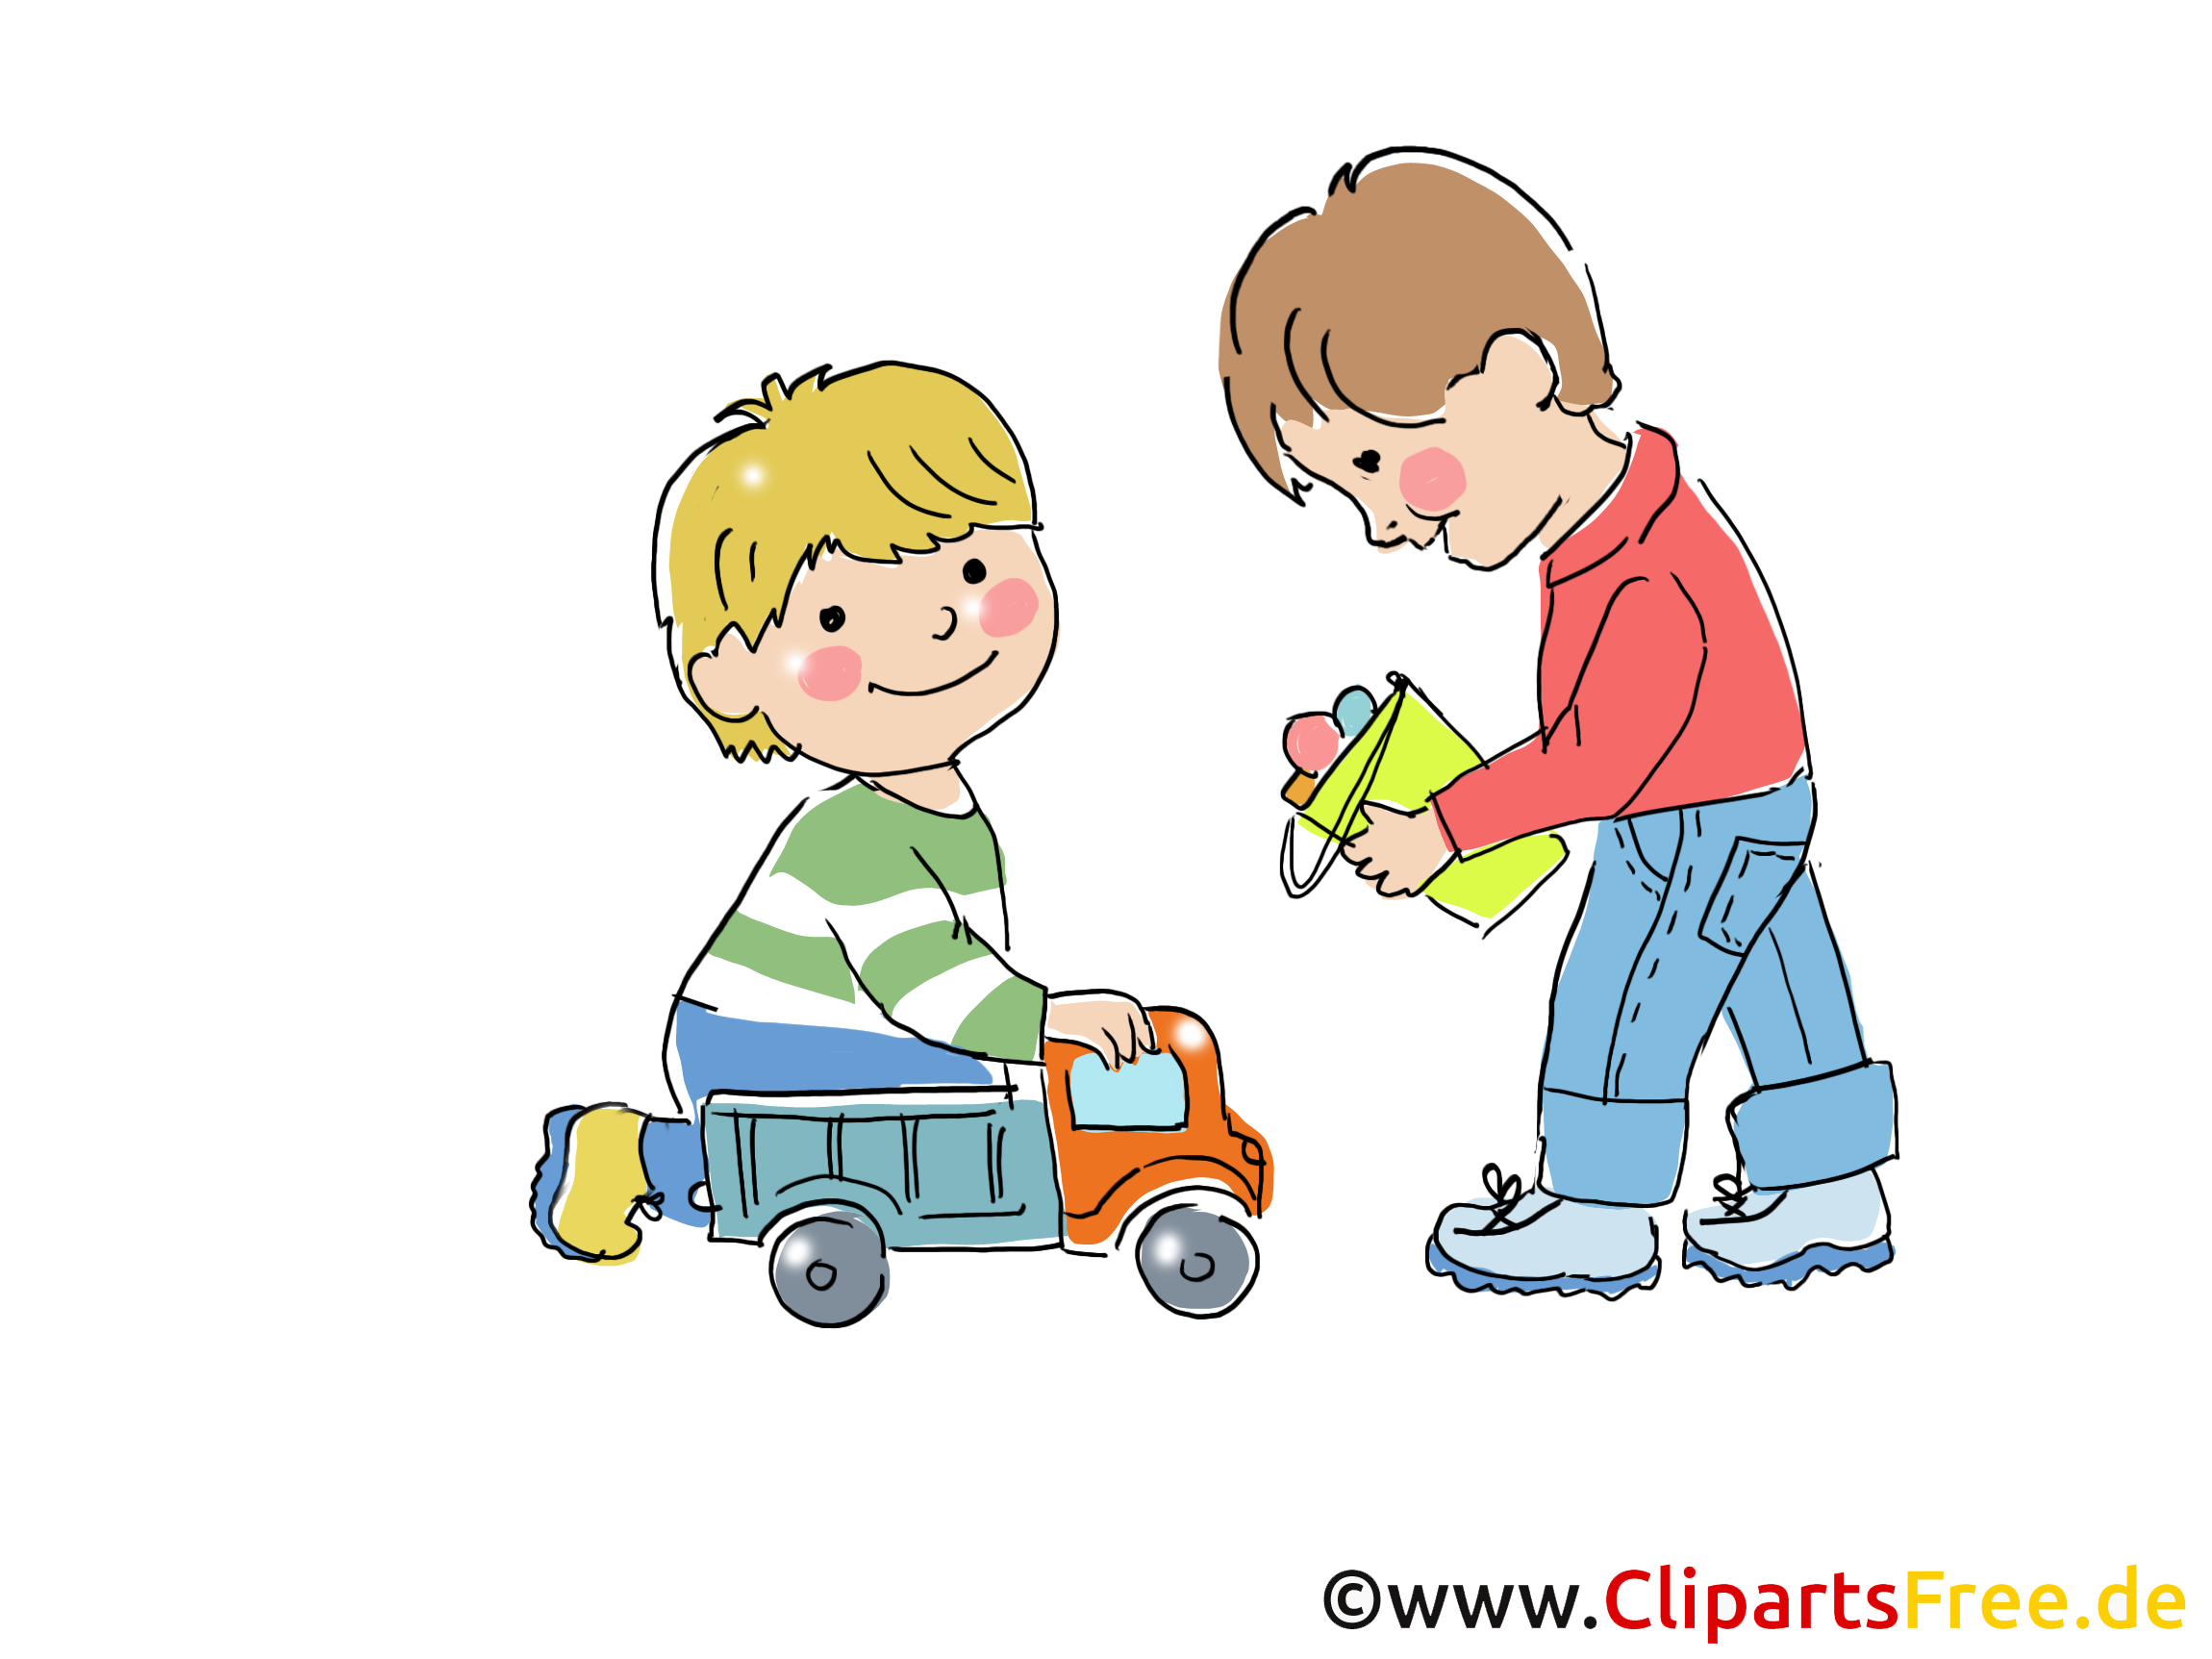 Kindergarten Bilder, Cliparts